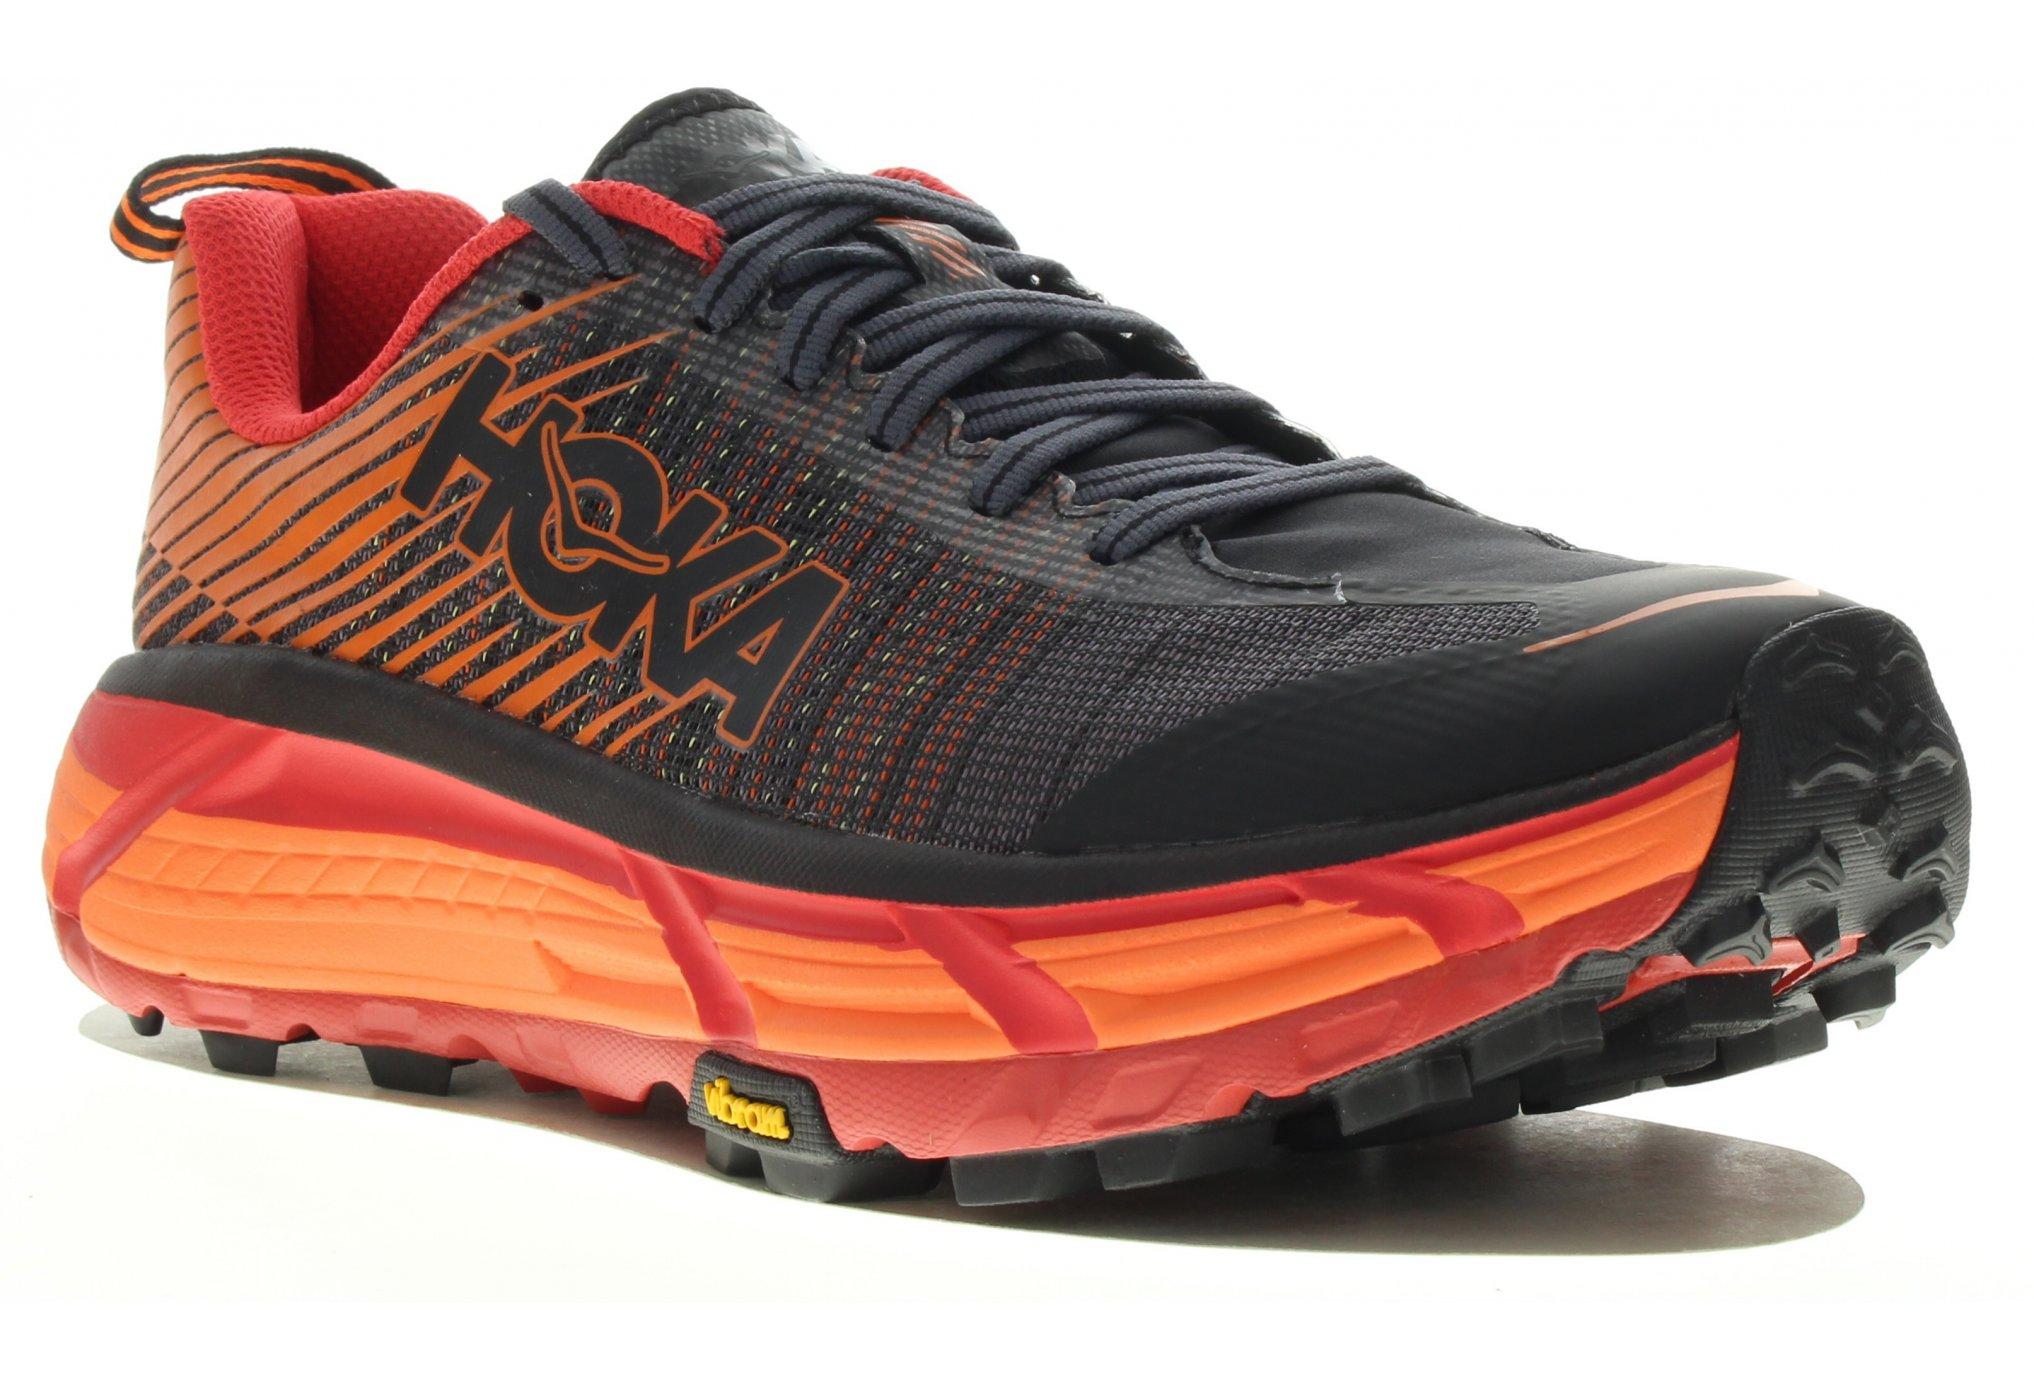 Hoka One One Evo Mafate 2 Chaussures running femme